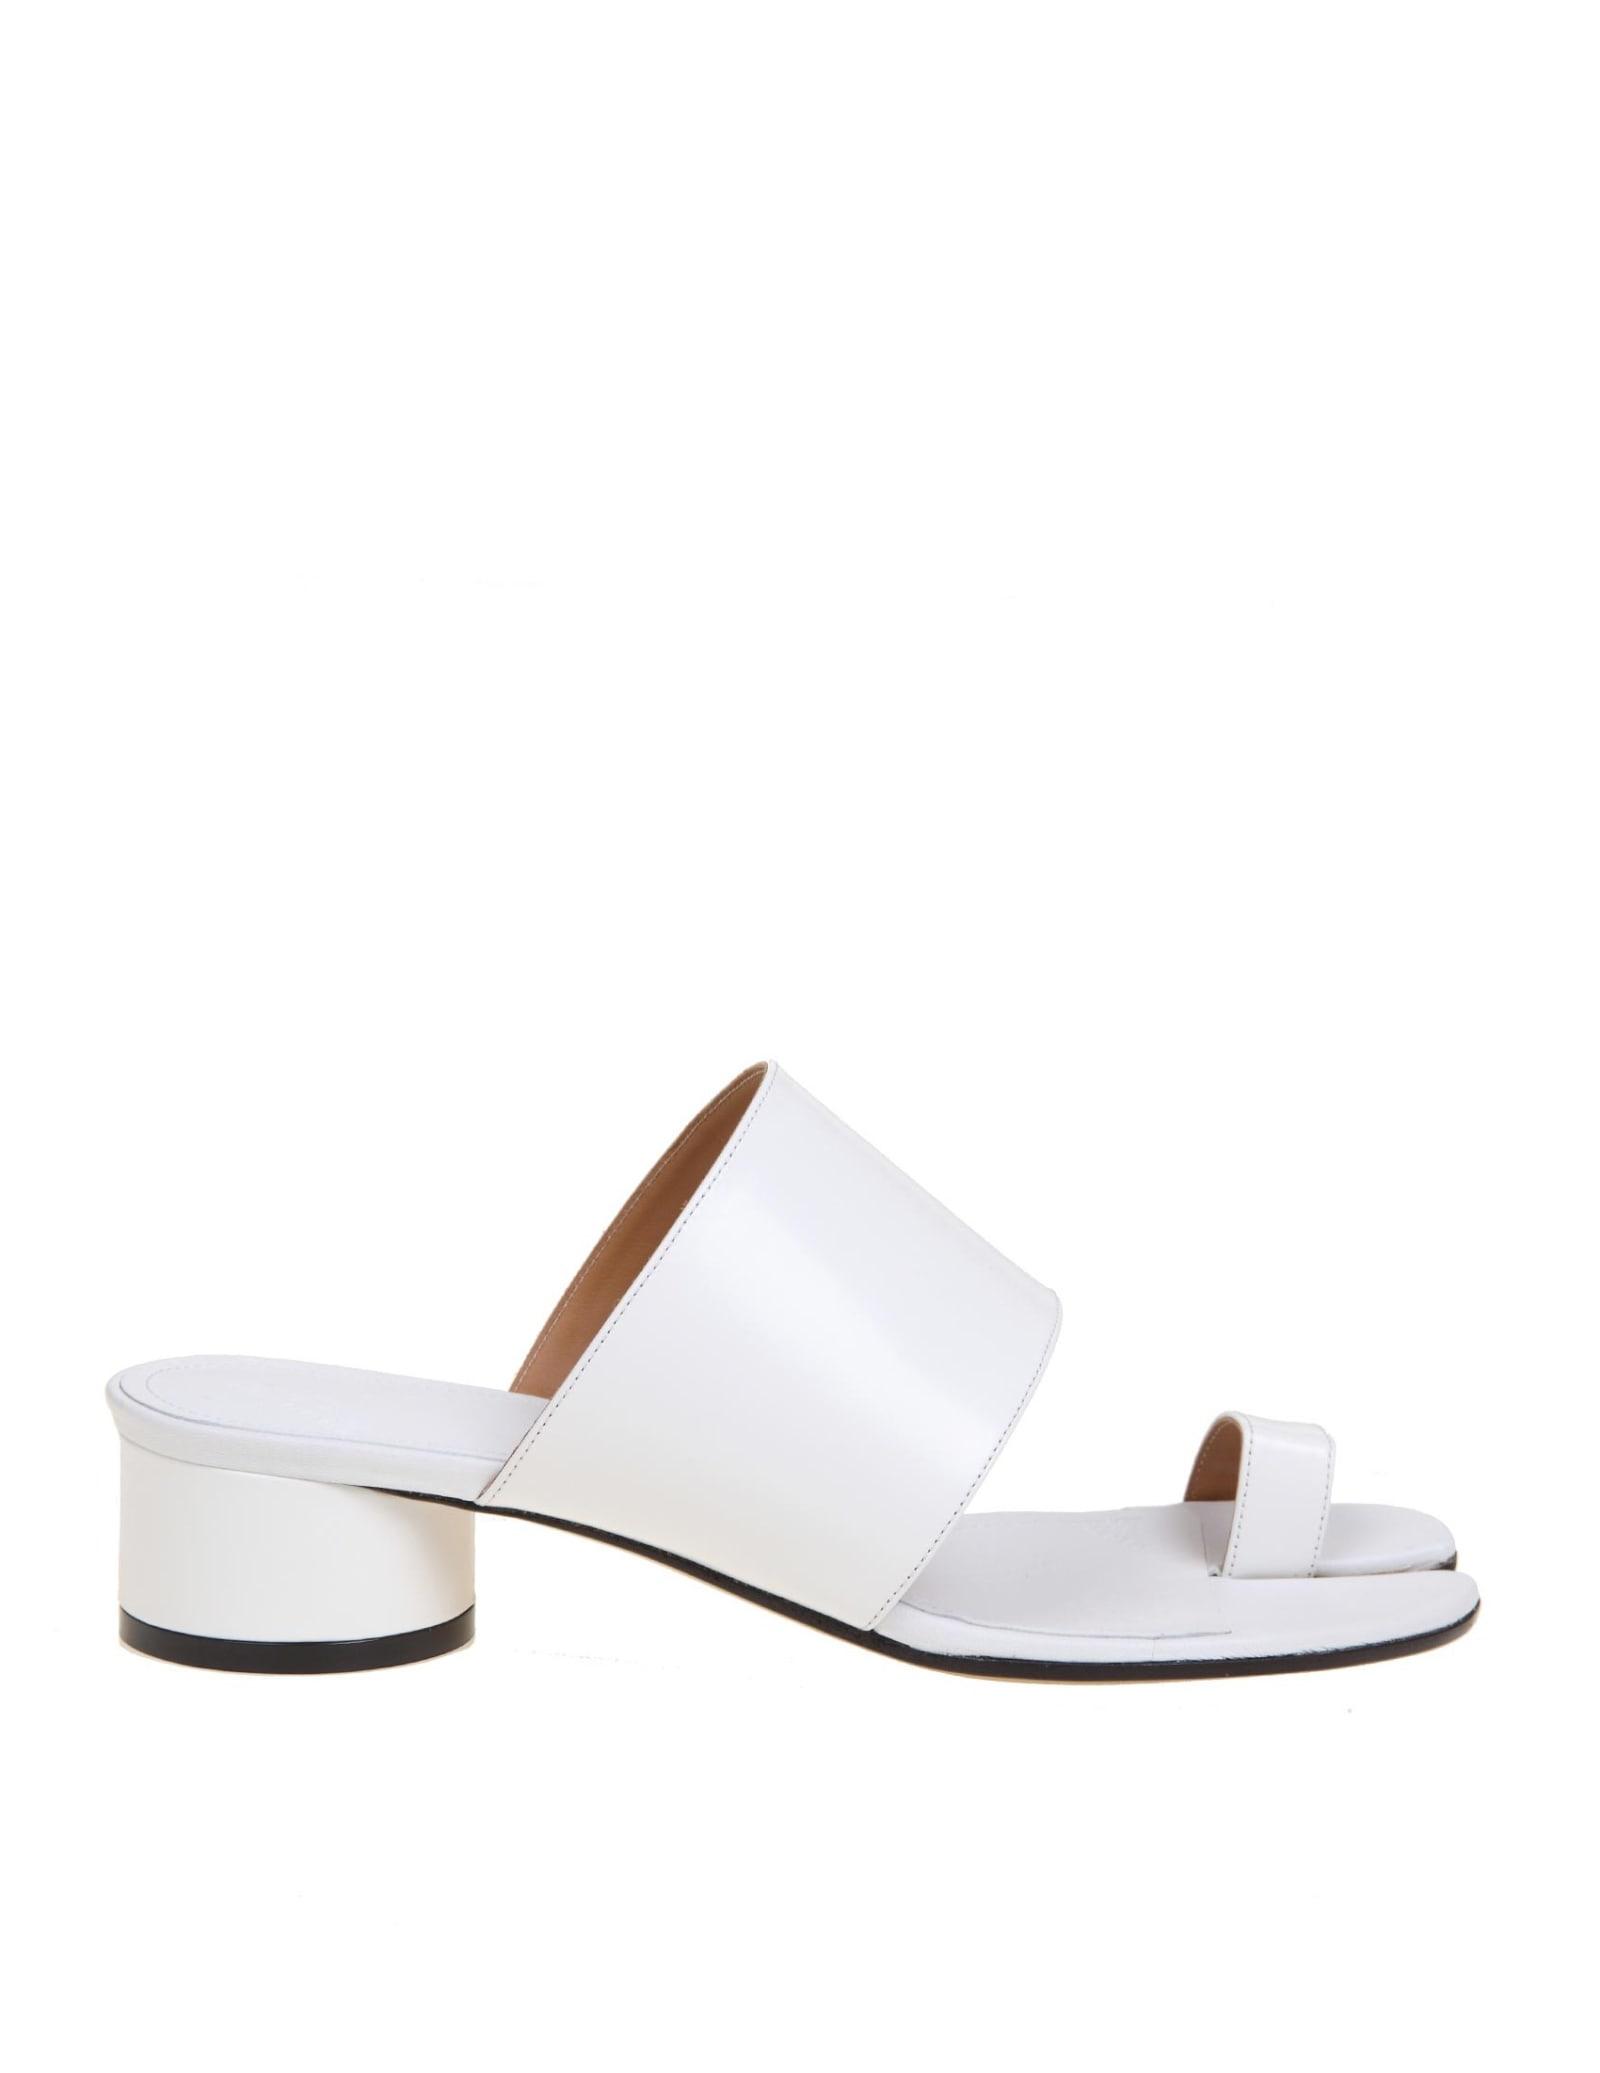 Maison Margiela Tabi Slippers In White Leather